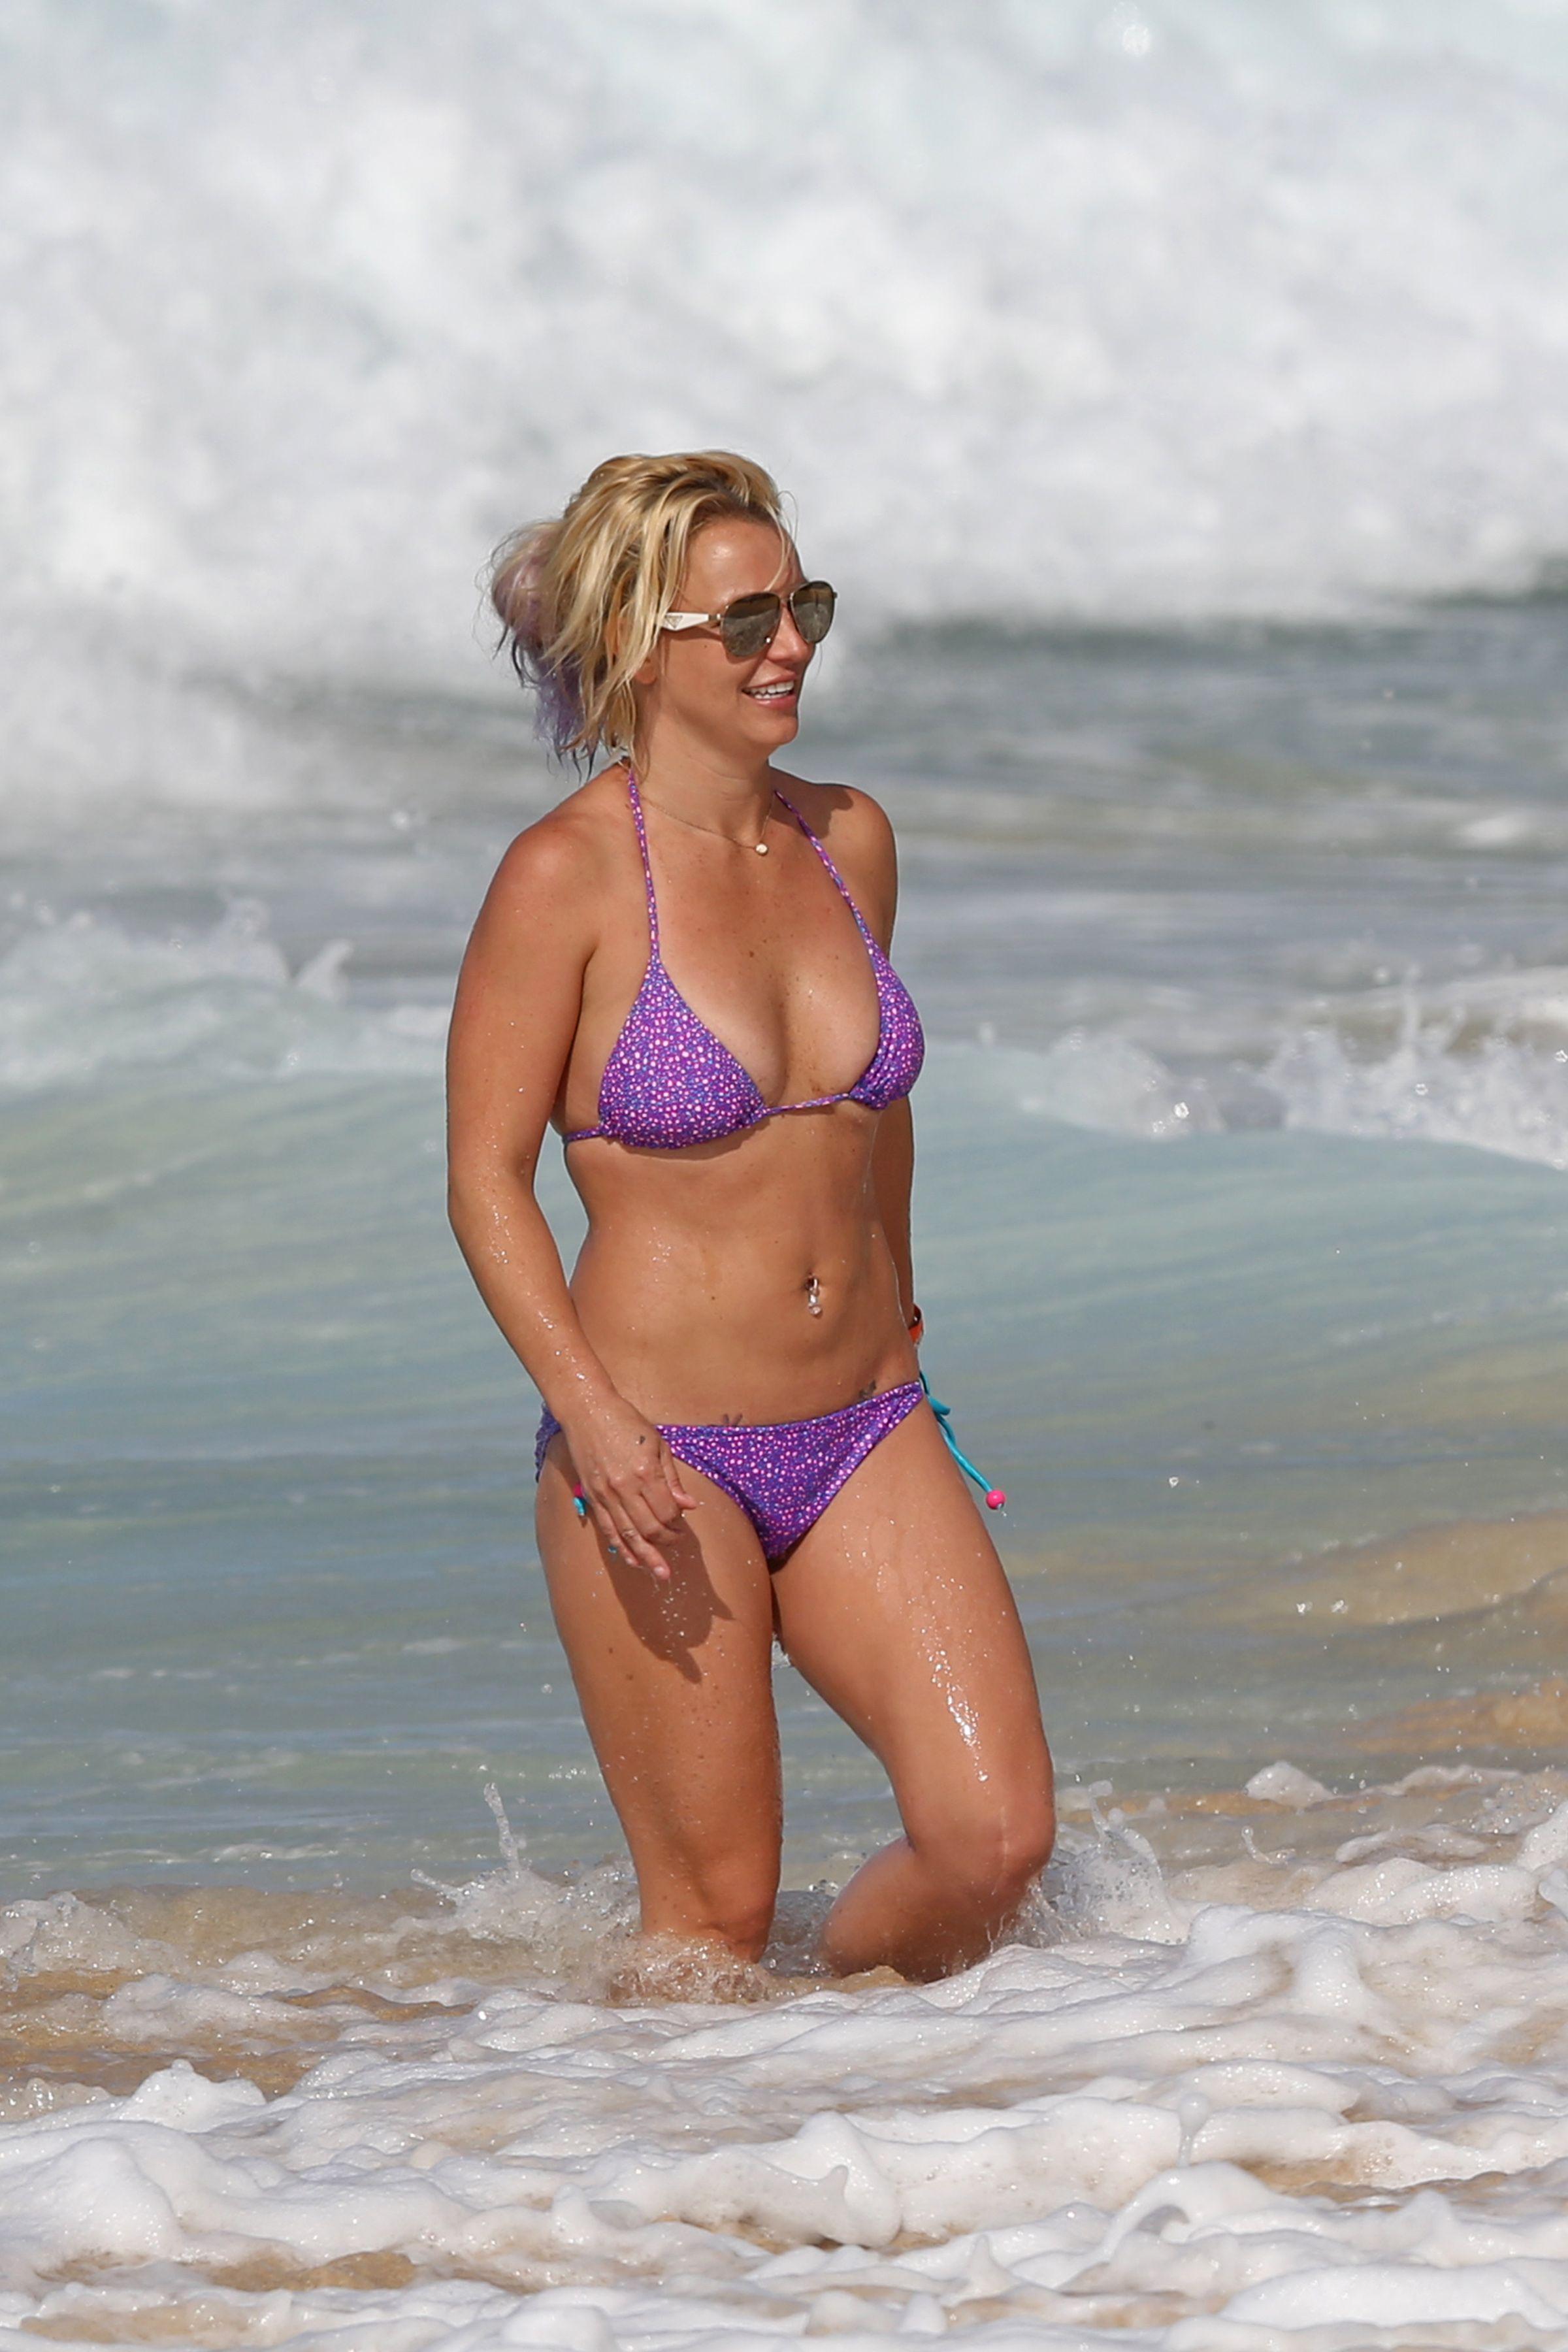 Jamie Lynn Spears Named Trustee of Britney Spears Massive